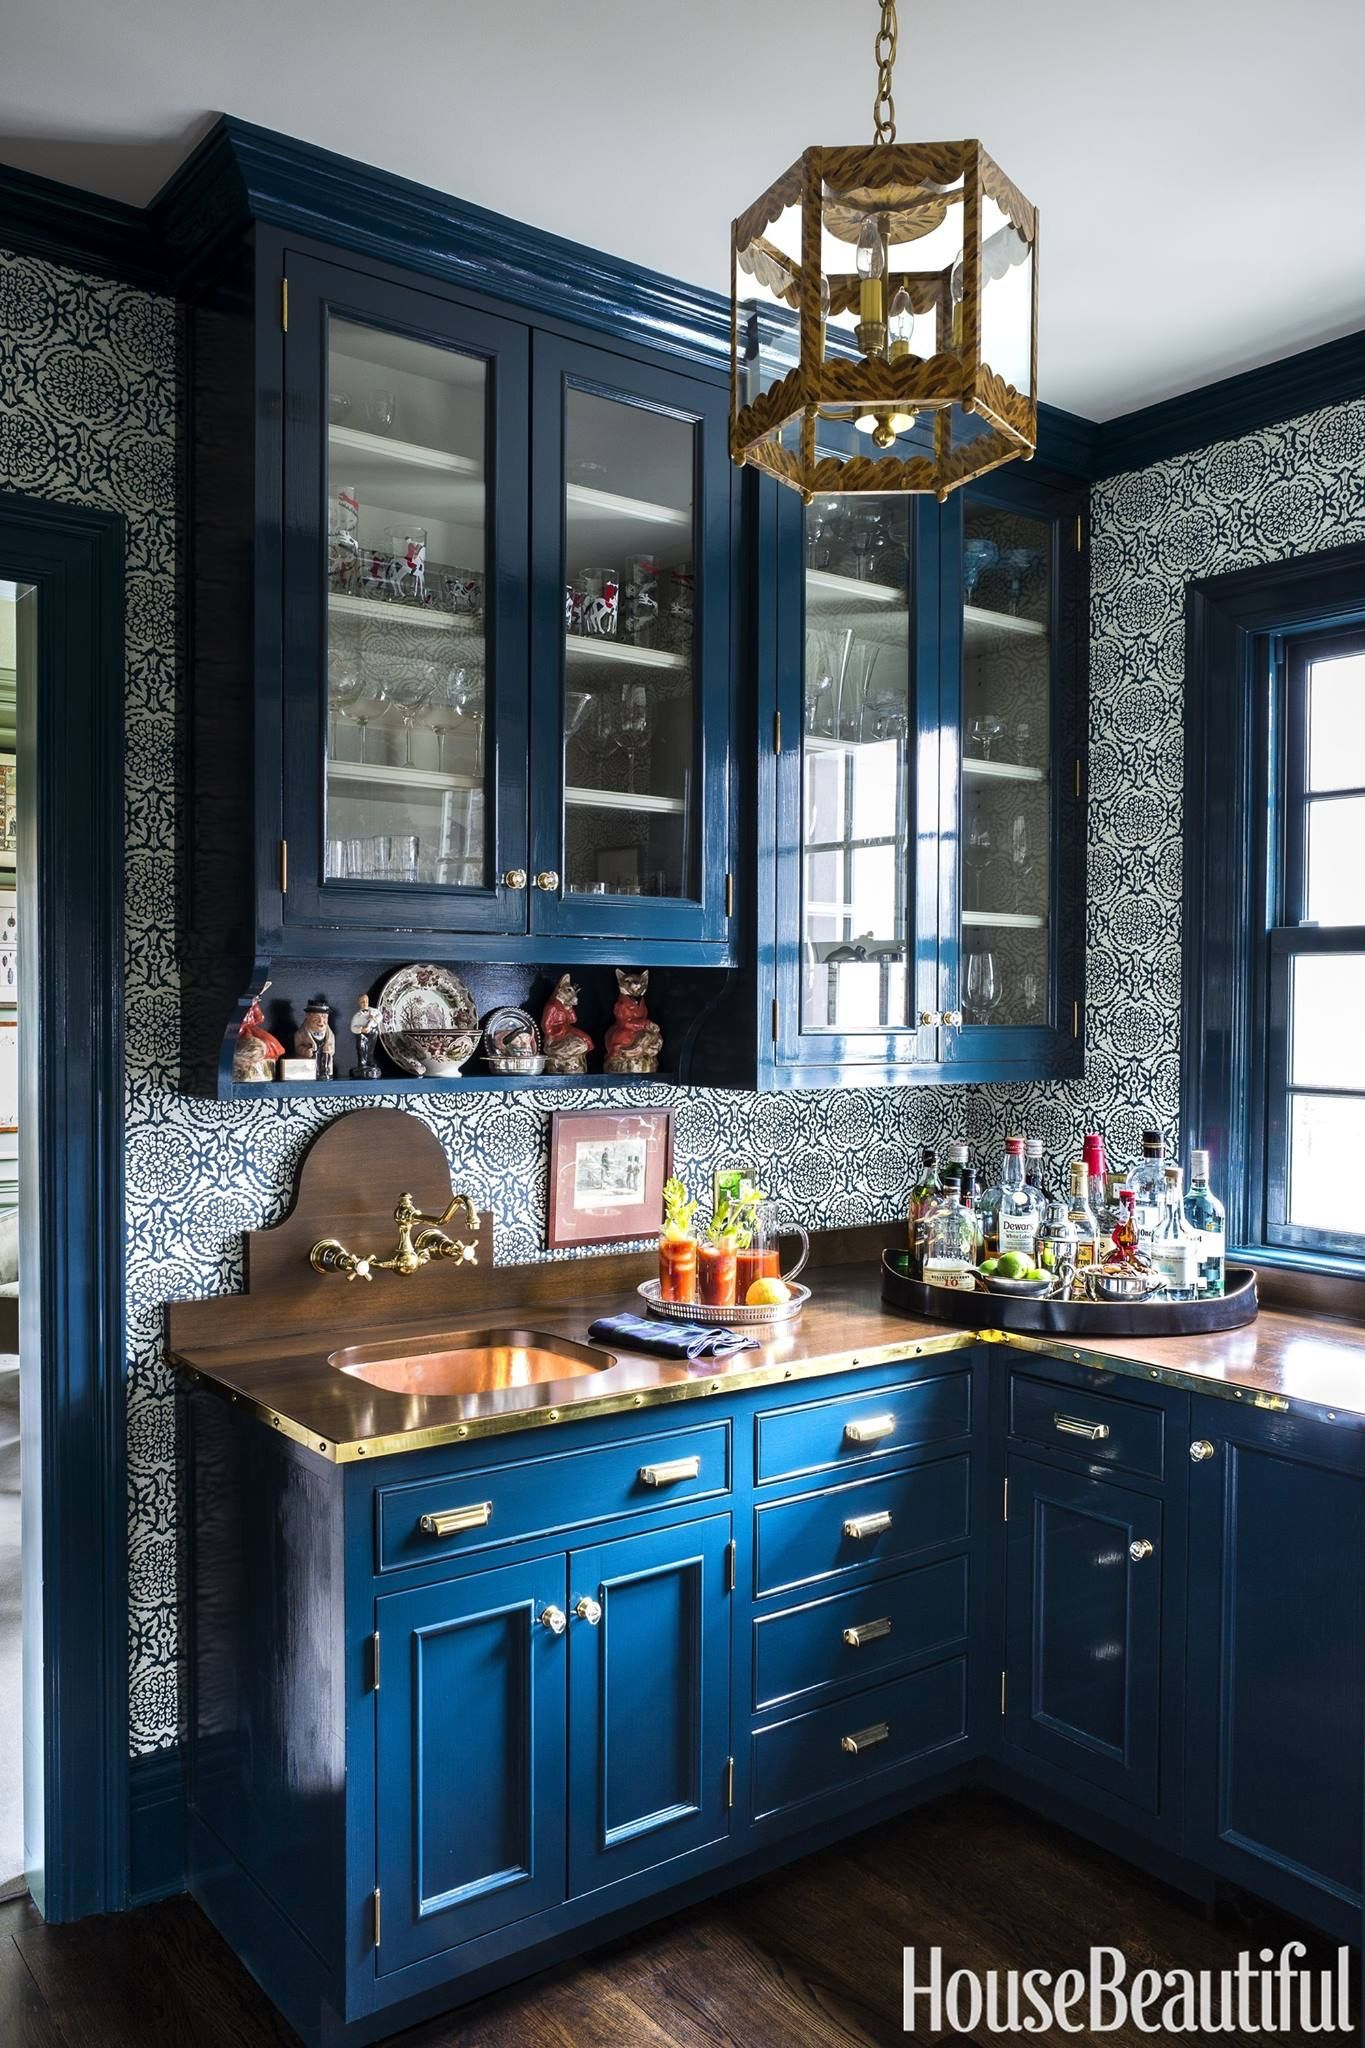 Pin de Jesan Barnes en Kitchen | Pinterest | Muebles idea, Casas y Ideas